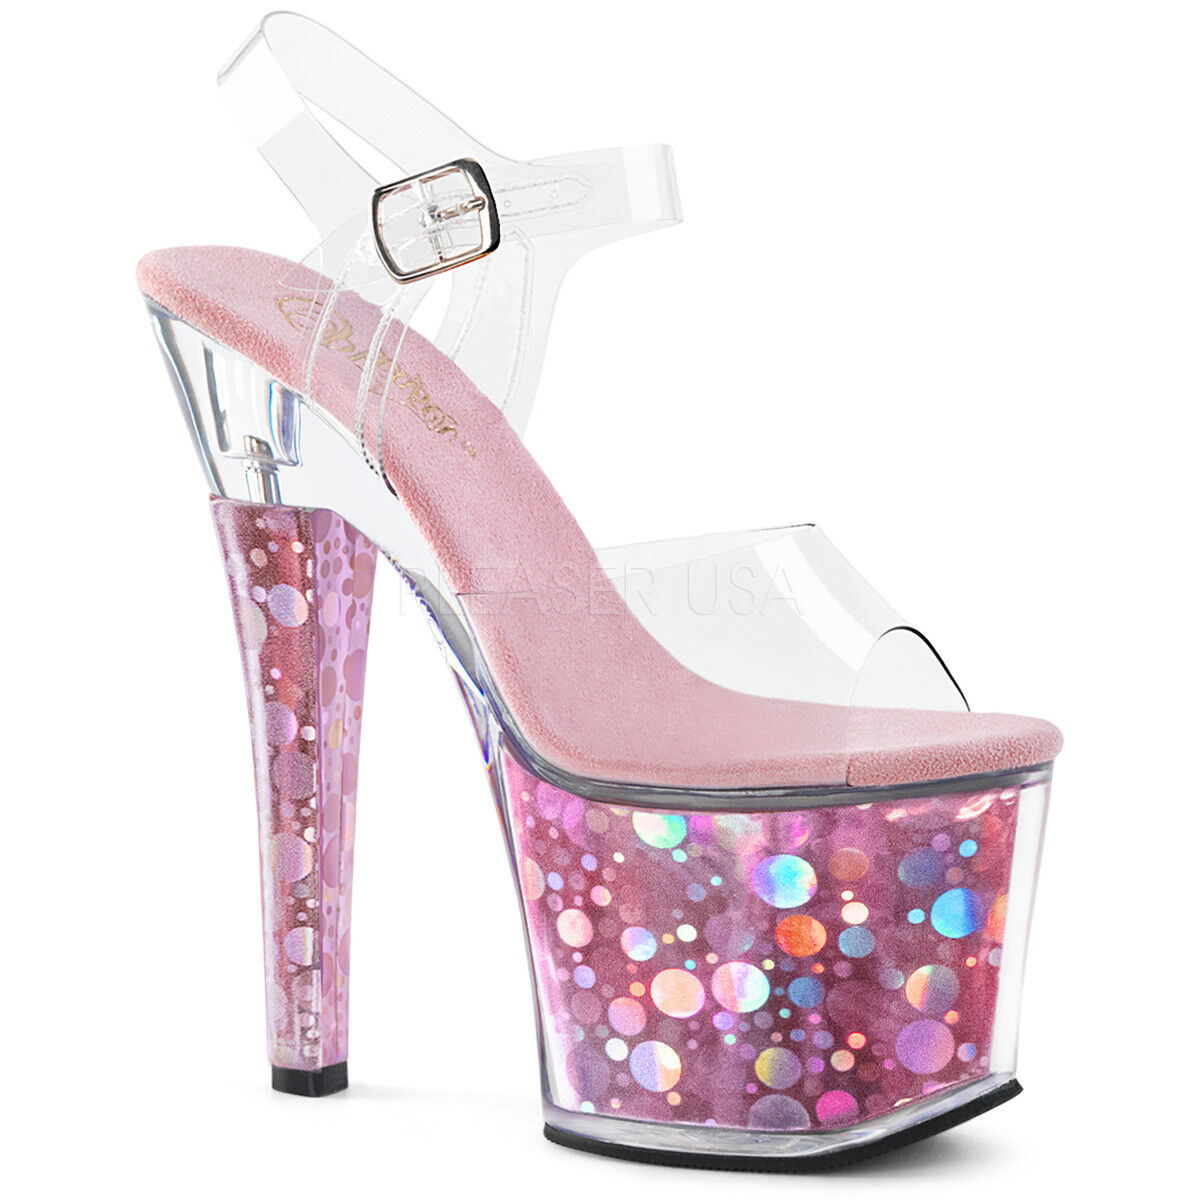 SALE PLEASER Sexy 7  Heel Pink Holographic Platform Stripper Clear Sandal shoes